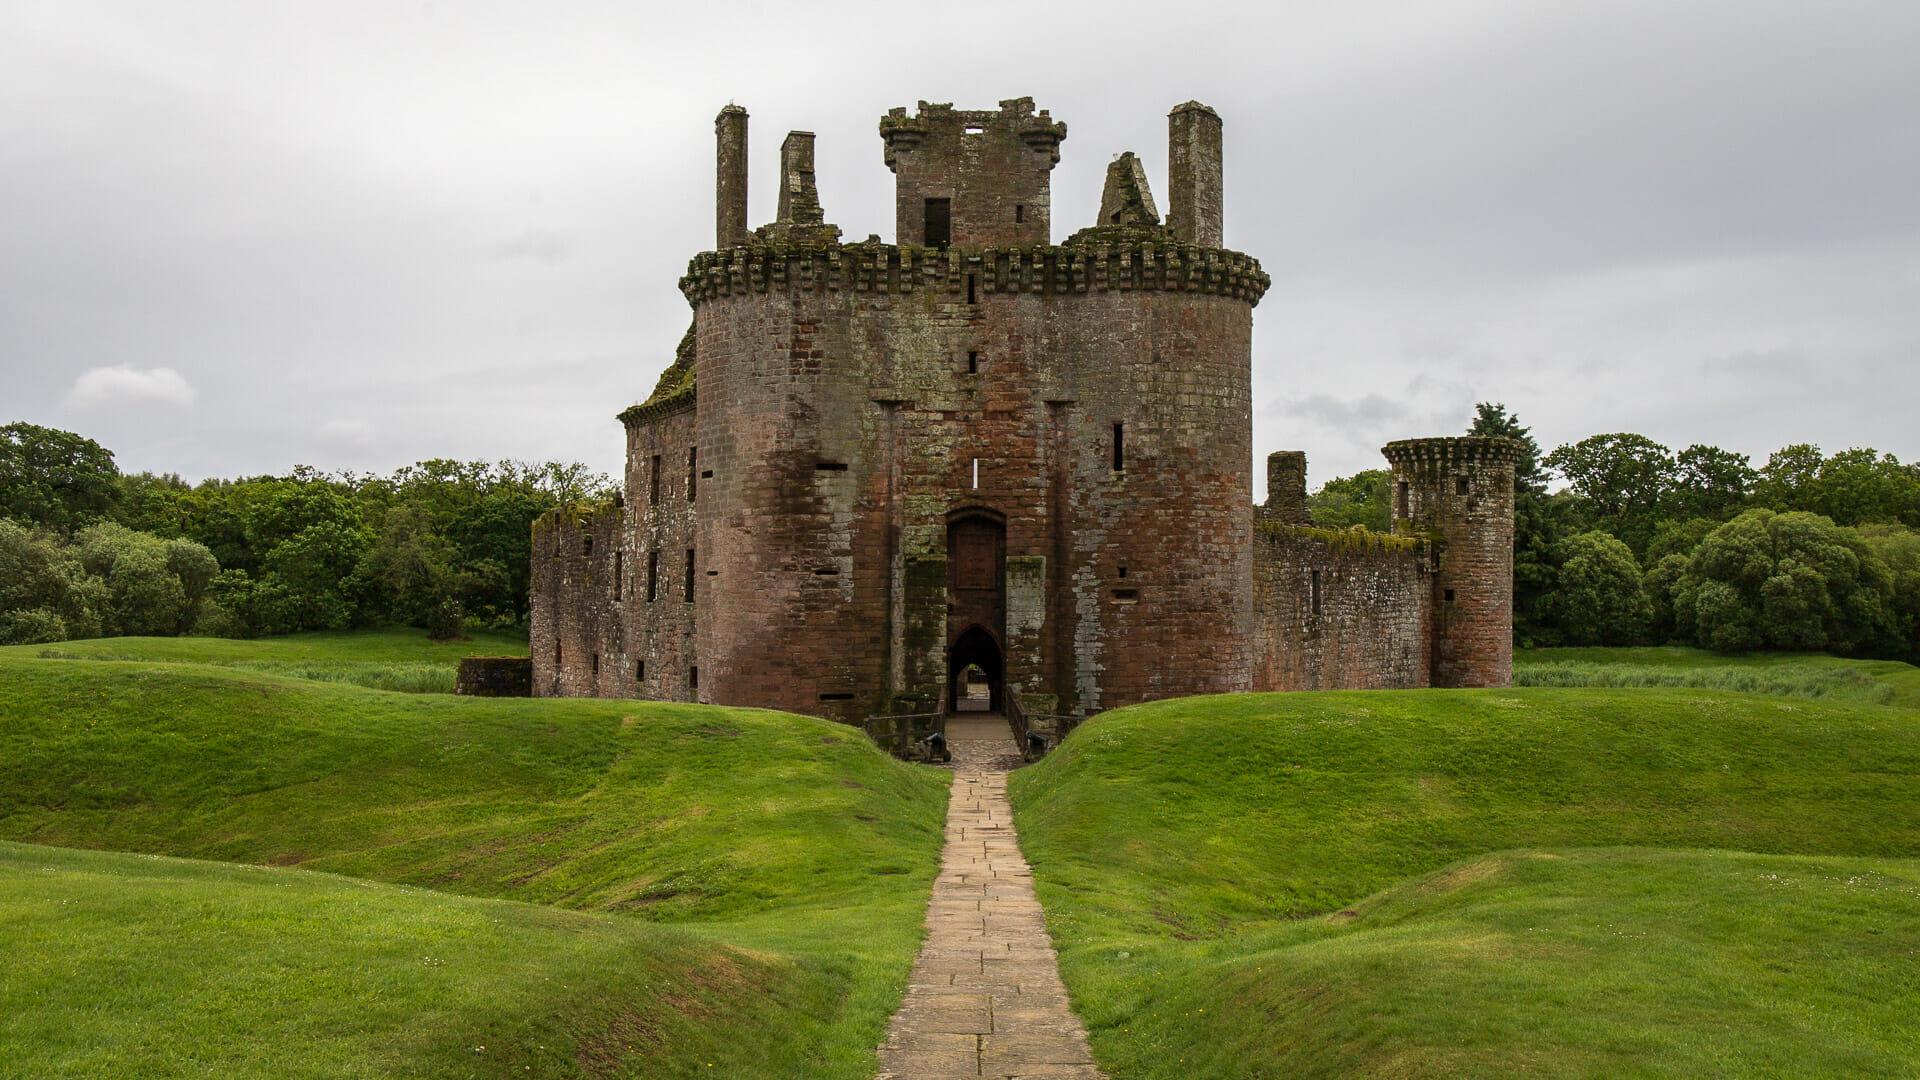 Der Zugang zur Caervalerock Castle